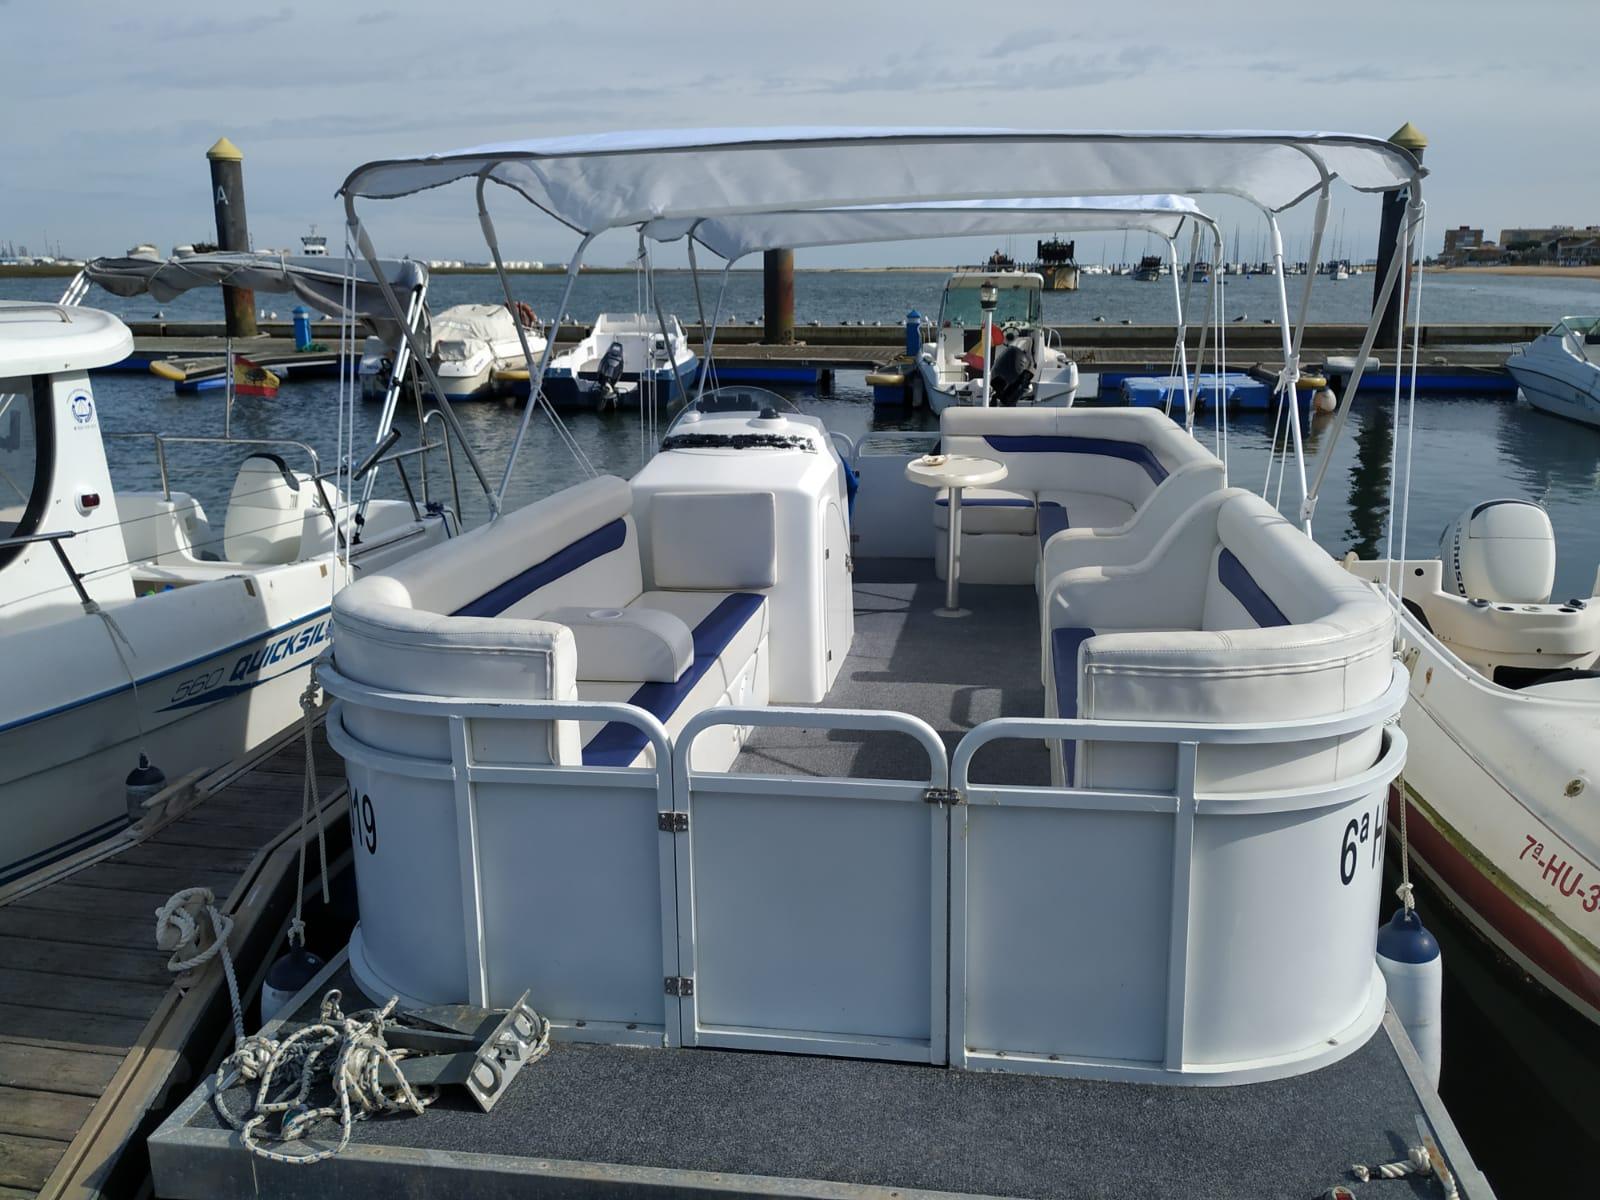 barco de alquiler atracado